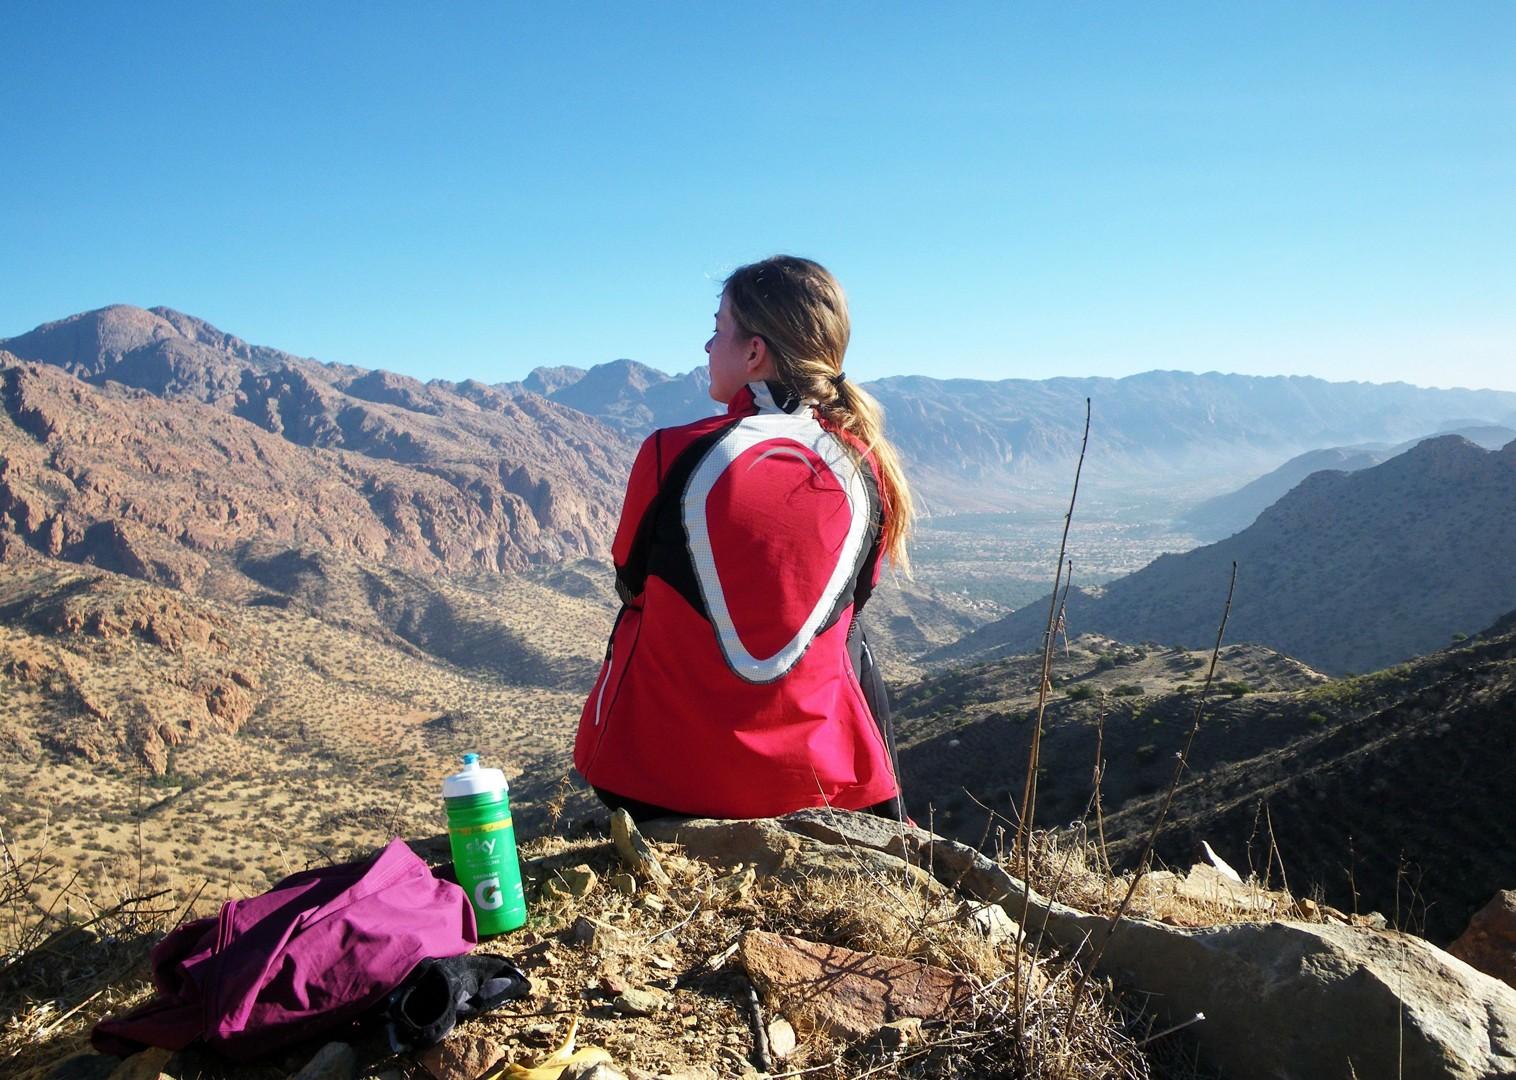 visit-morocco-road-cycling-holiday.jpg - Morocco - Road Atlas - Road Cycling